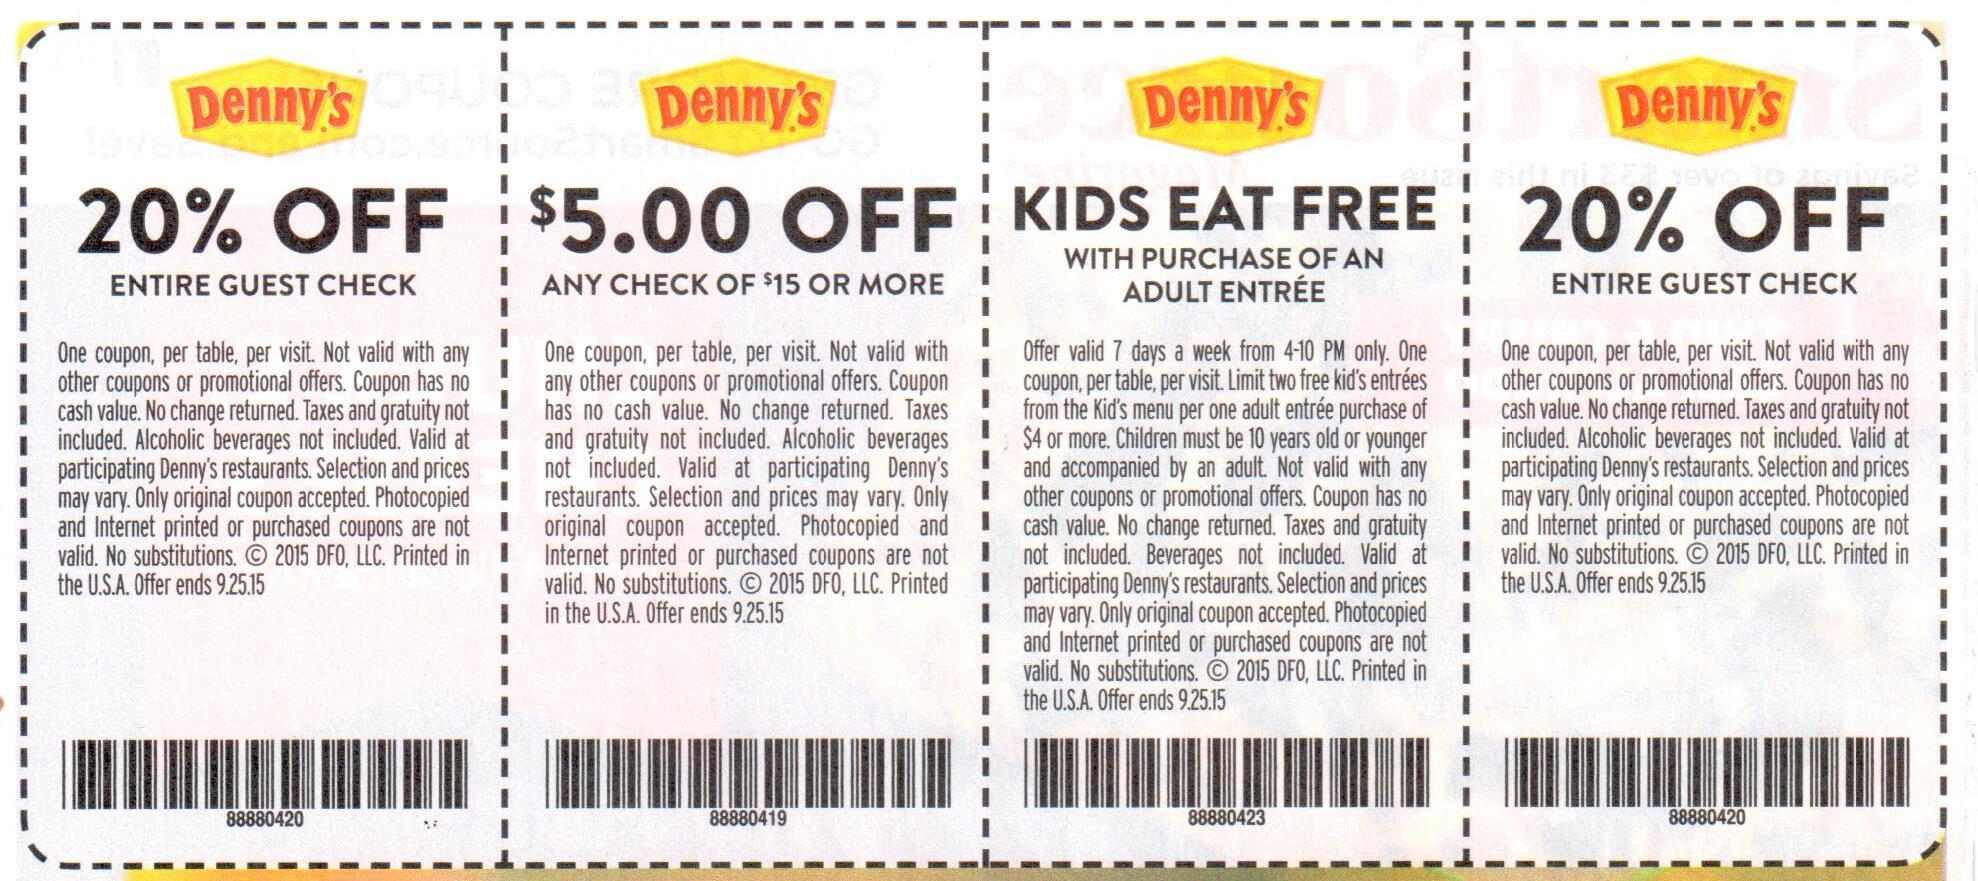 online-dennys-internet-coupons